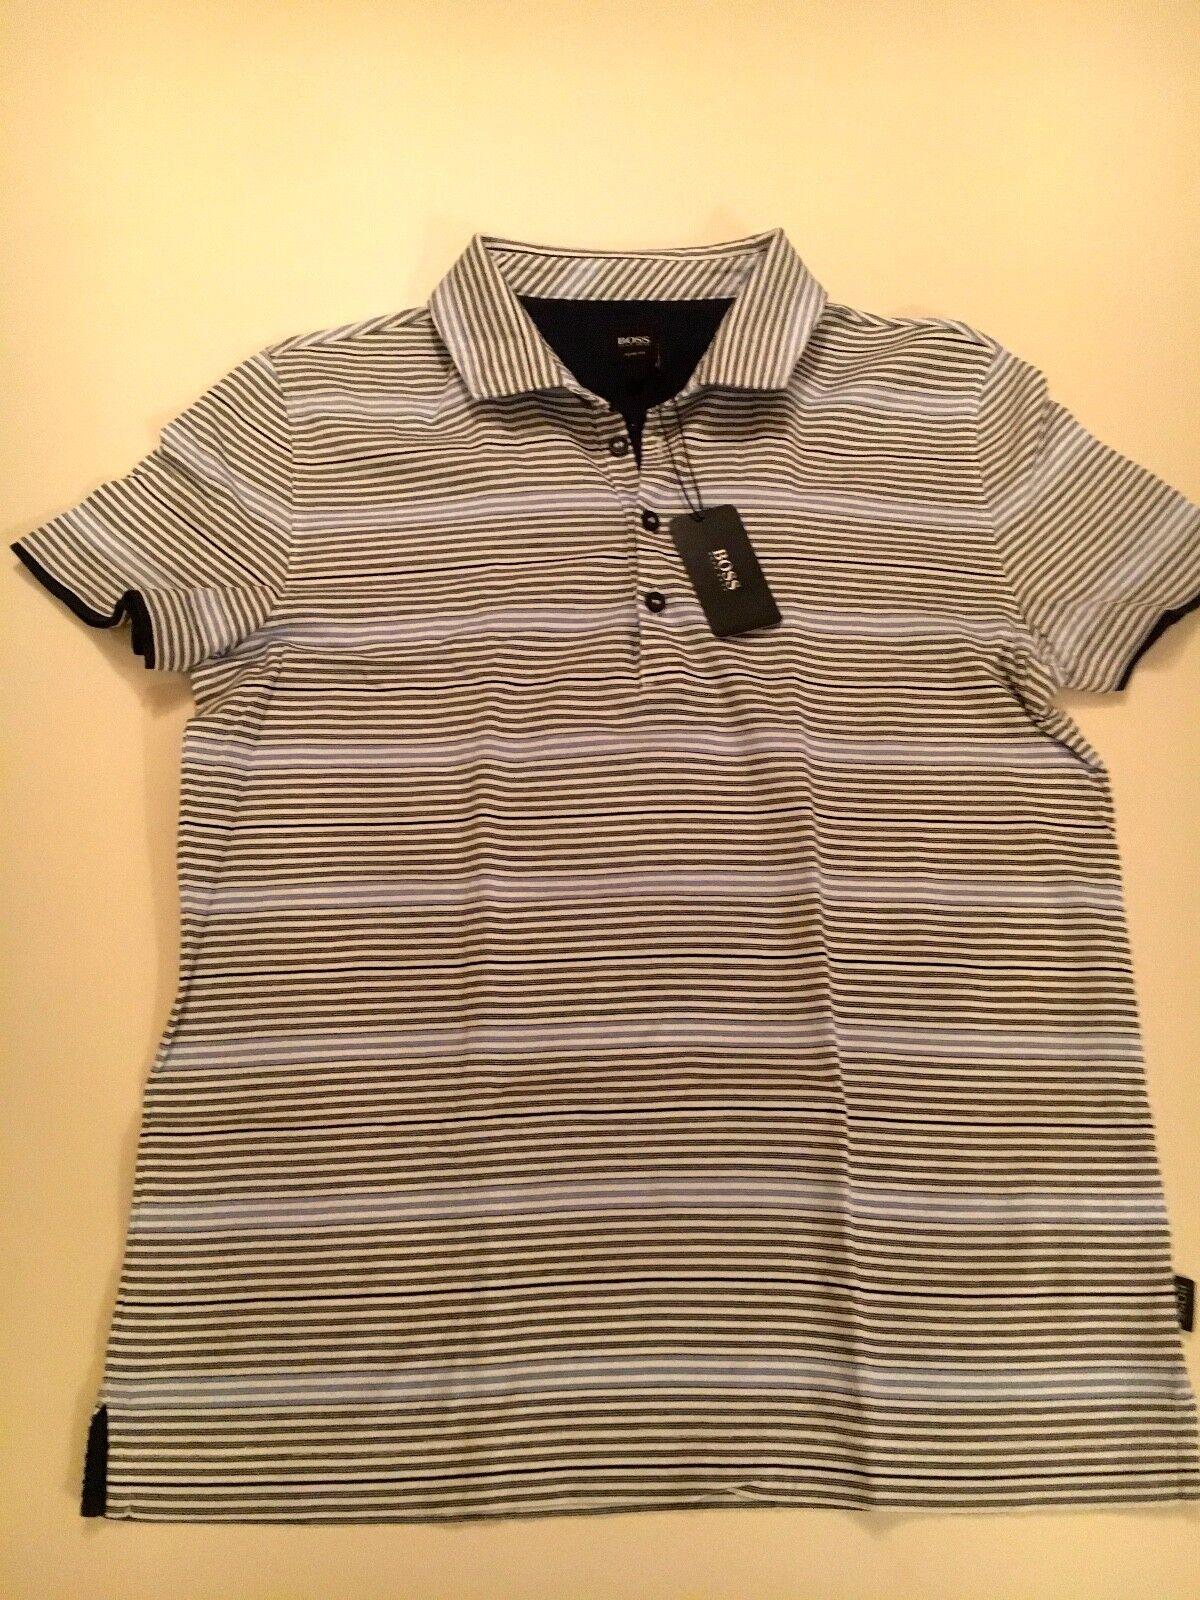 BNWT Hugo Boss Polo Shirt Taglia Taglia Shirt L Slim Fit a4dc9a